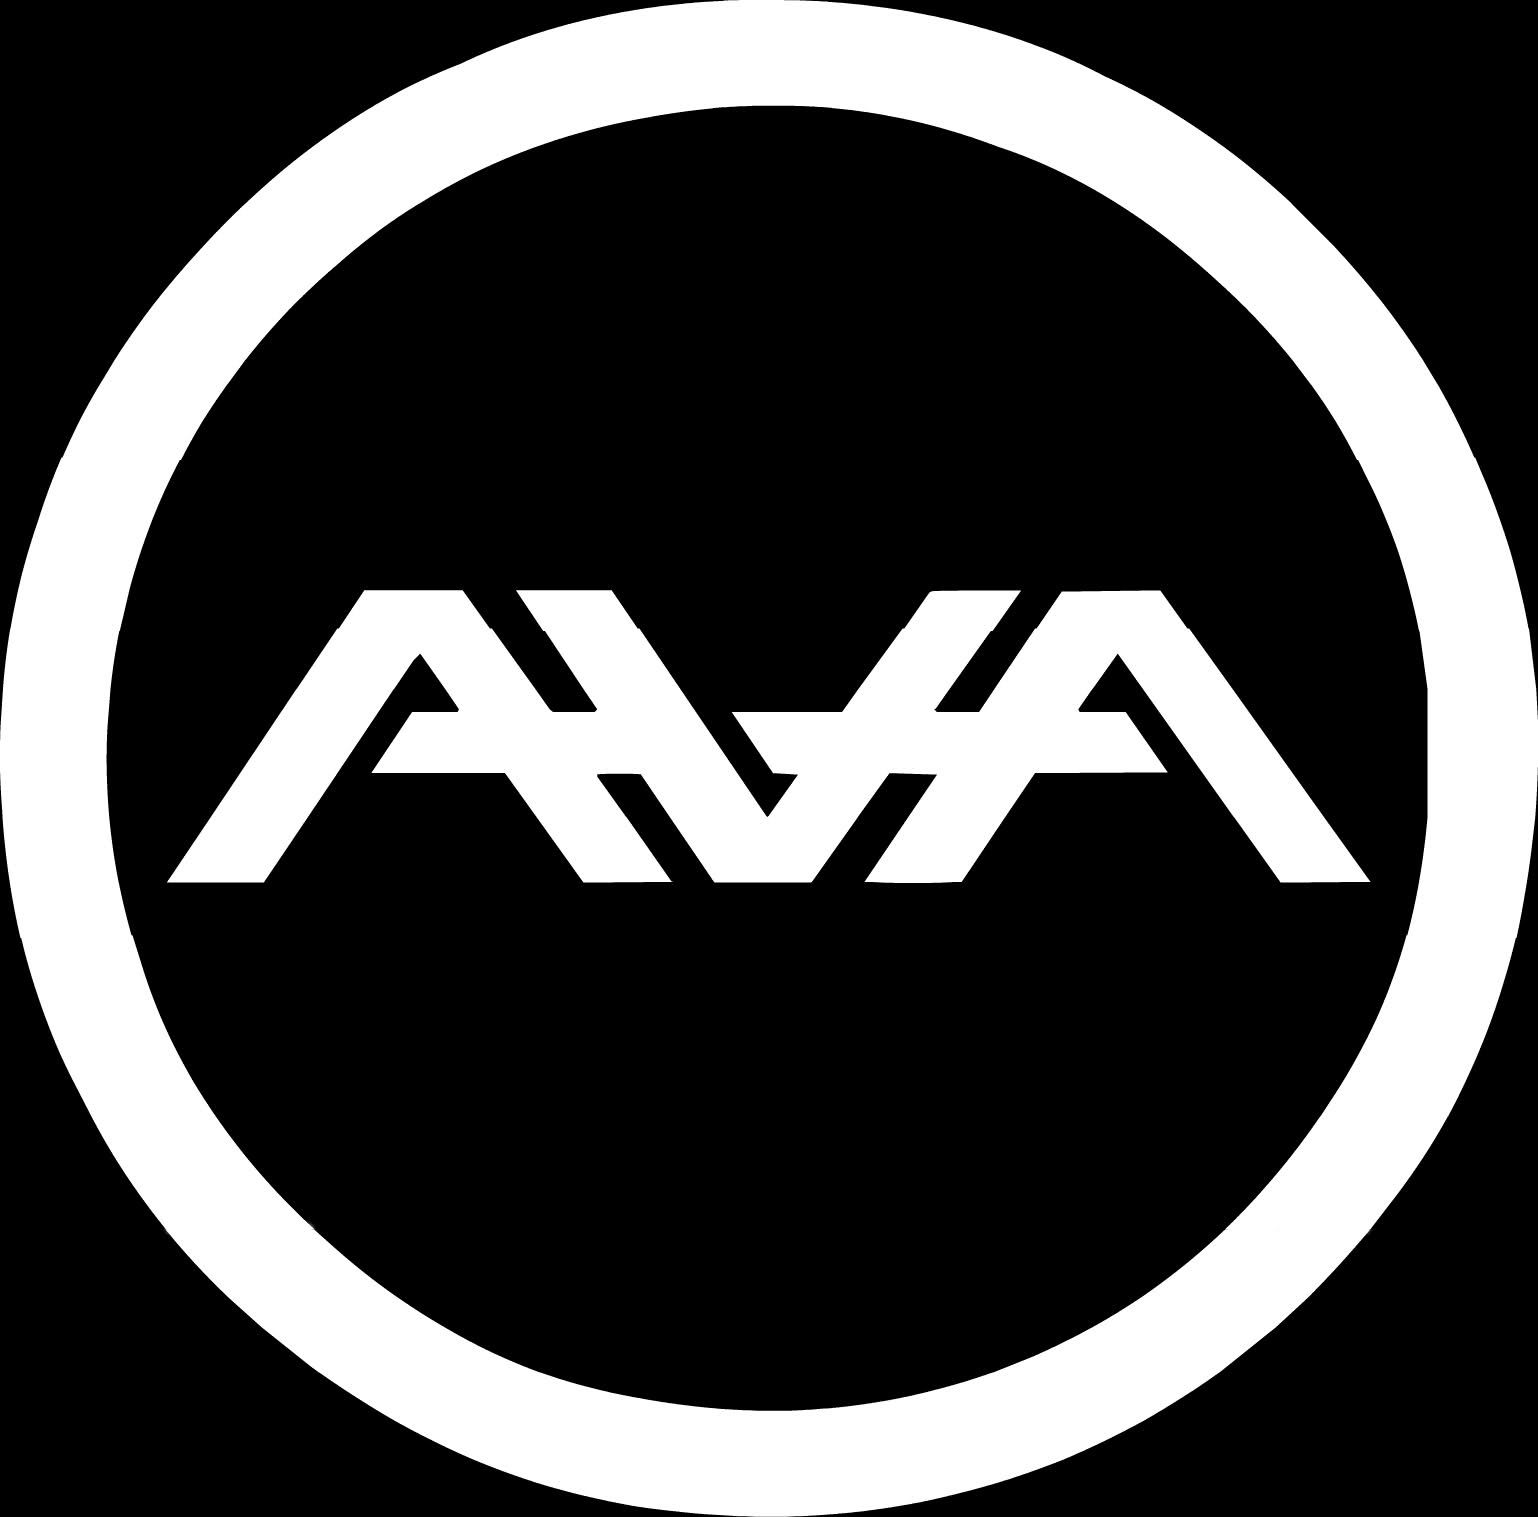 angels and airwaves logo.